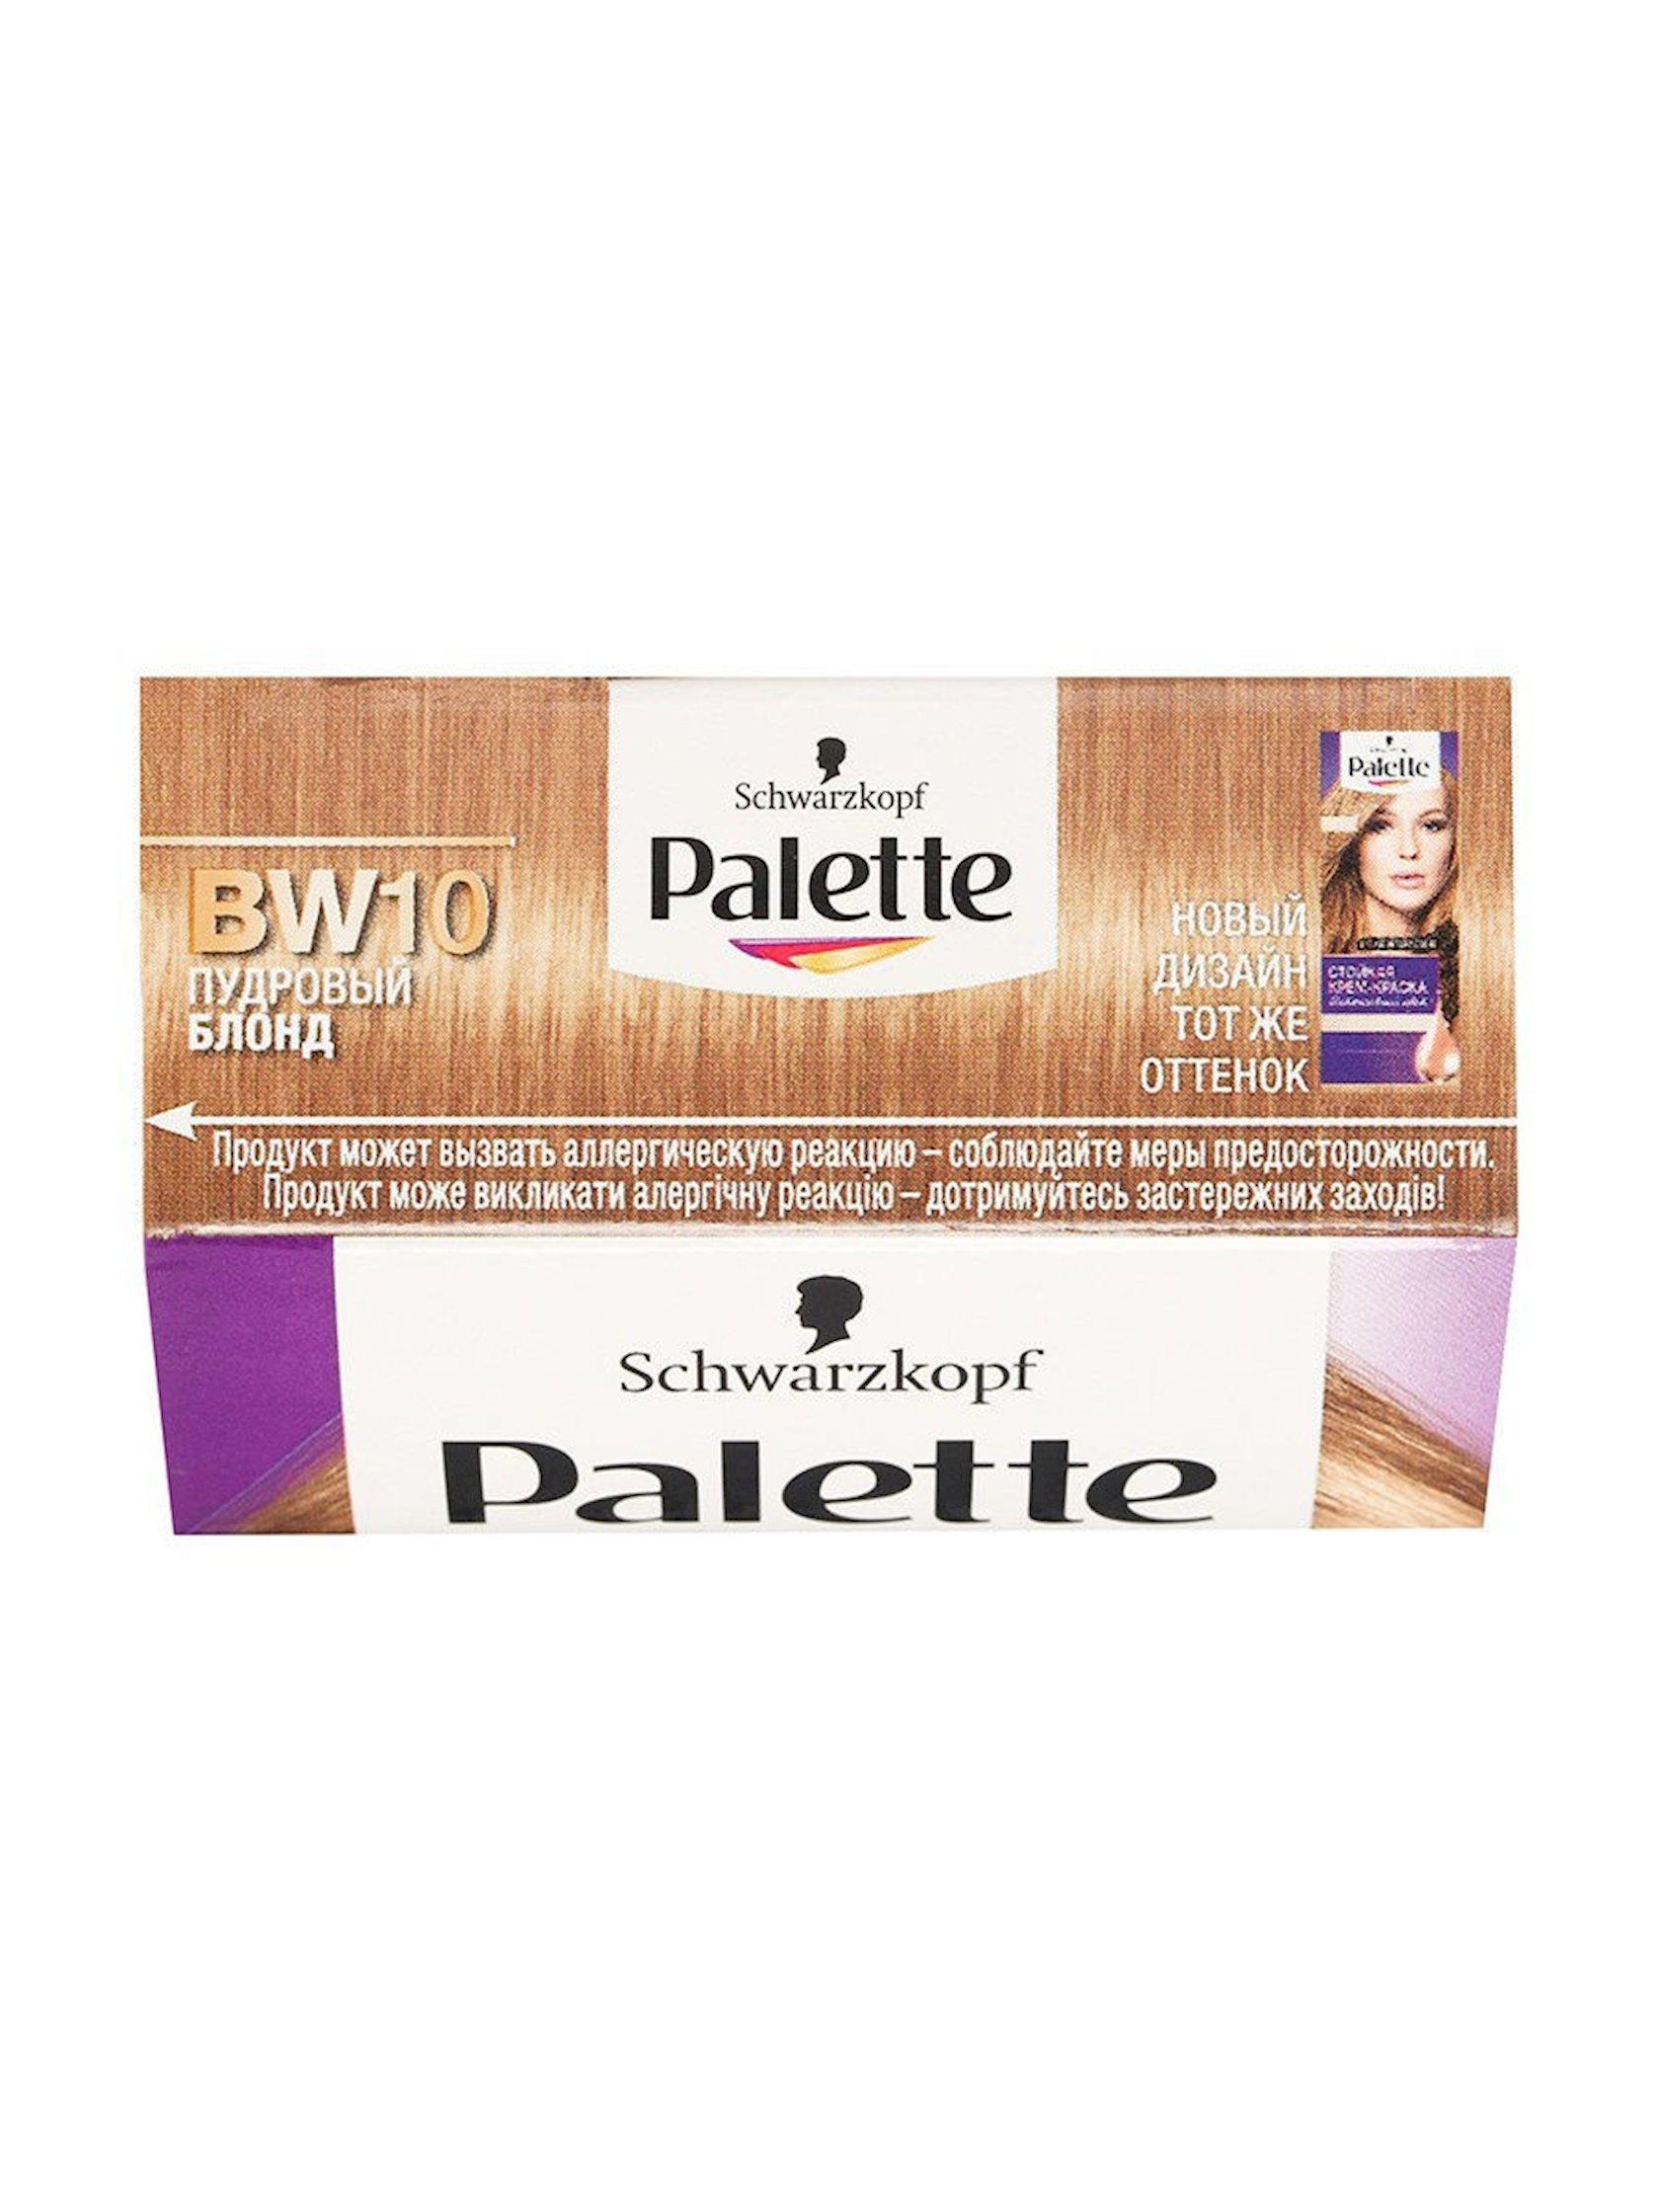 Saç üçün qalıcı krem-boya Palette Intensive Color BW10 10-46 Pudralı blond